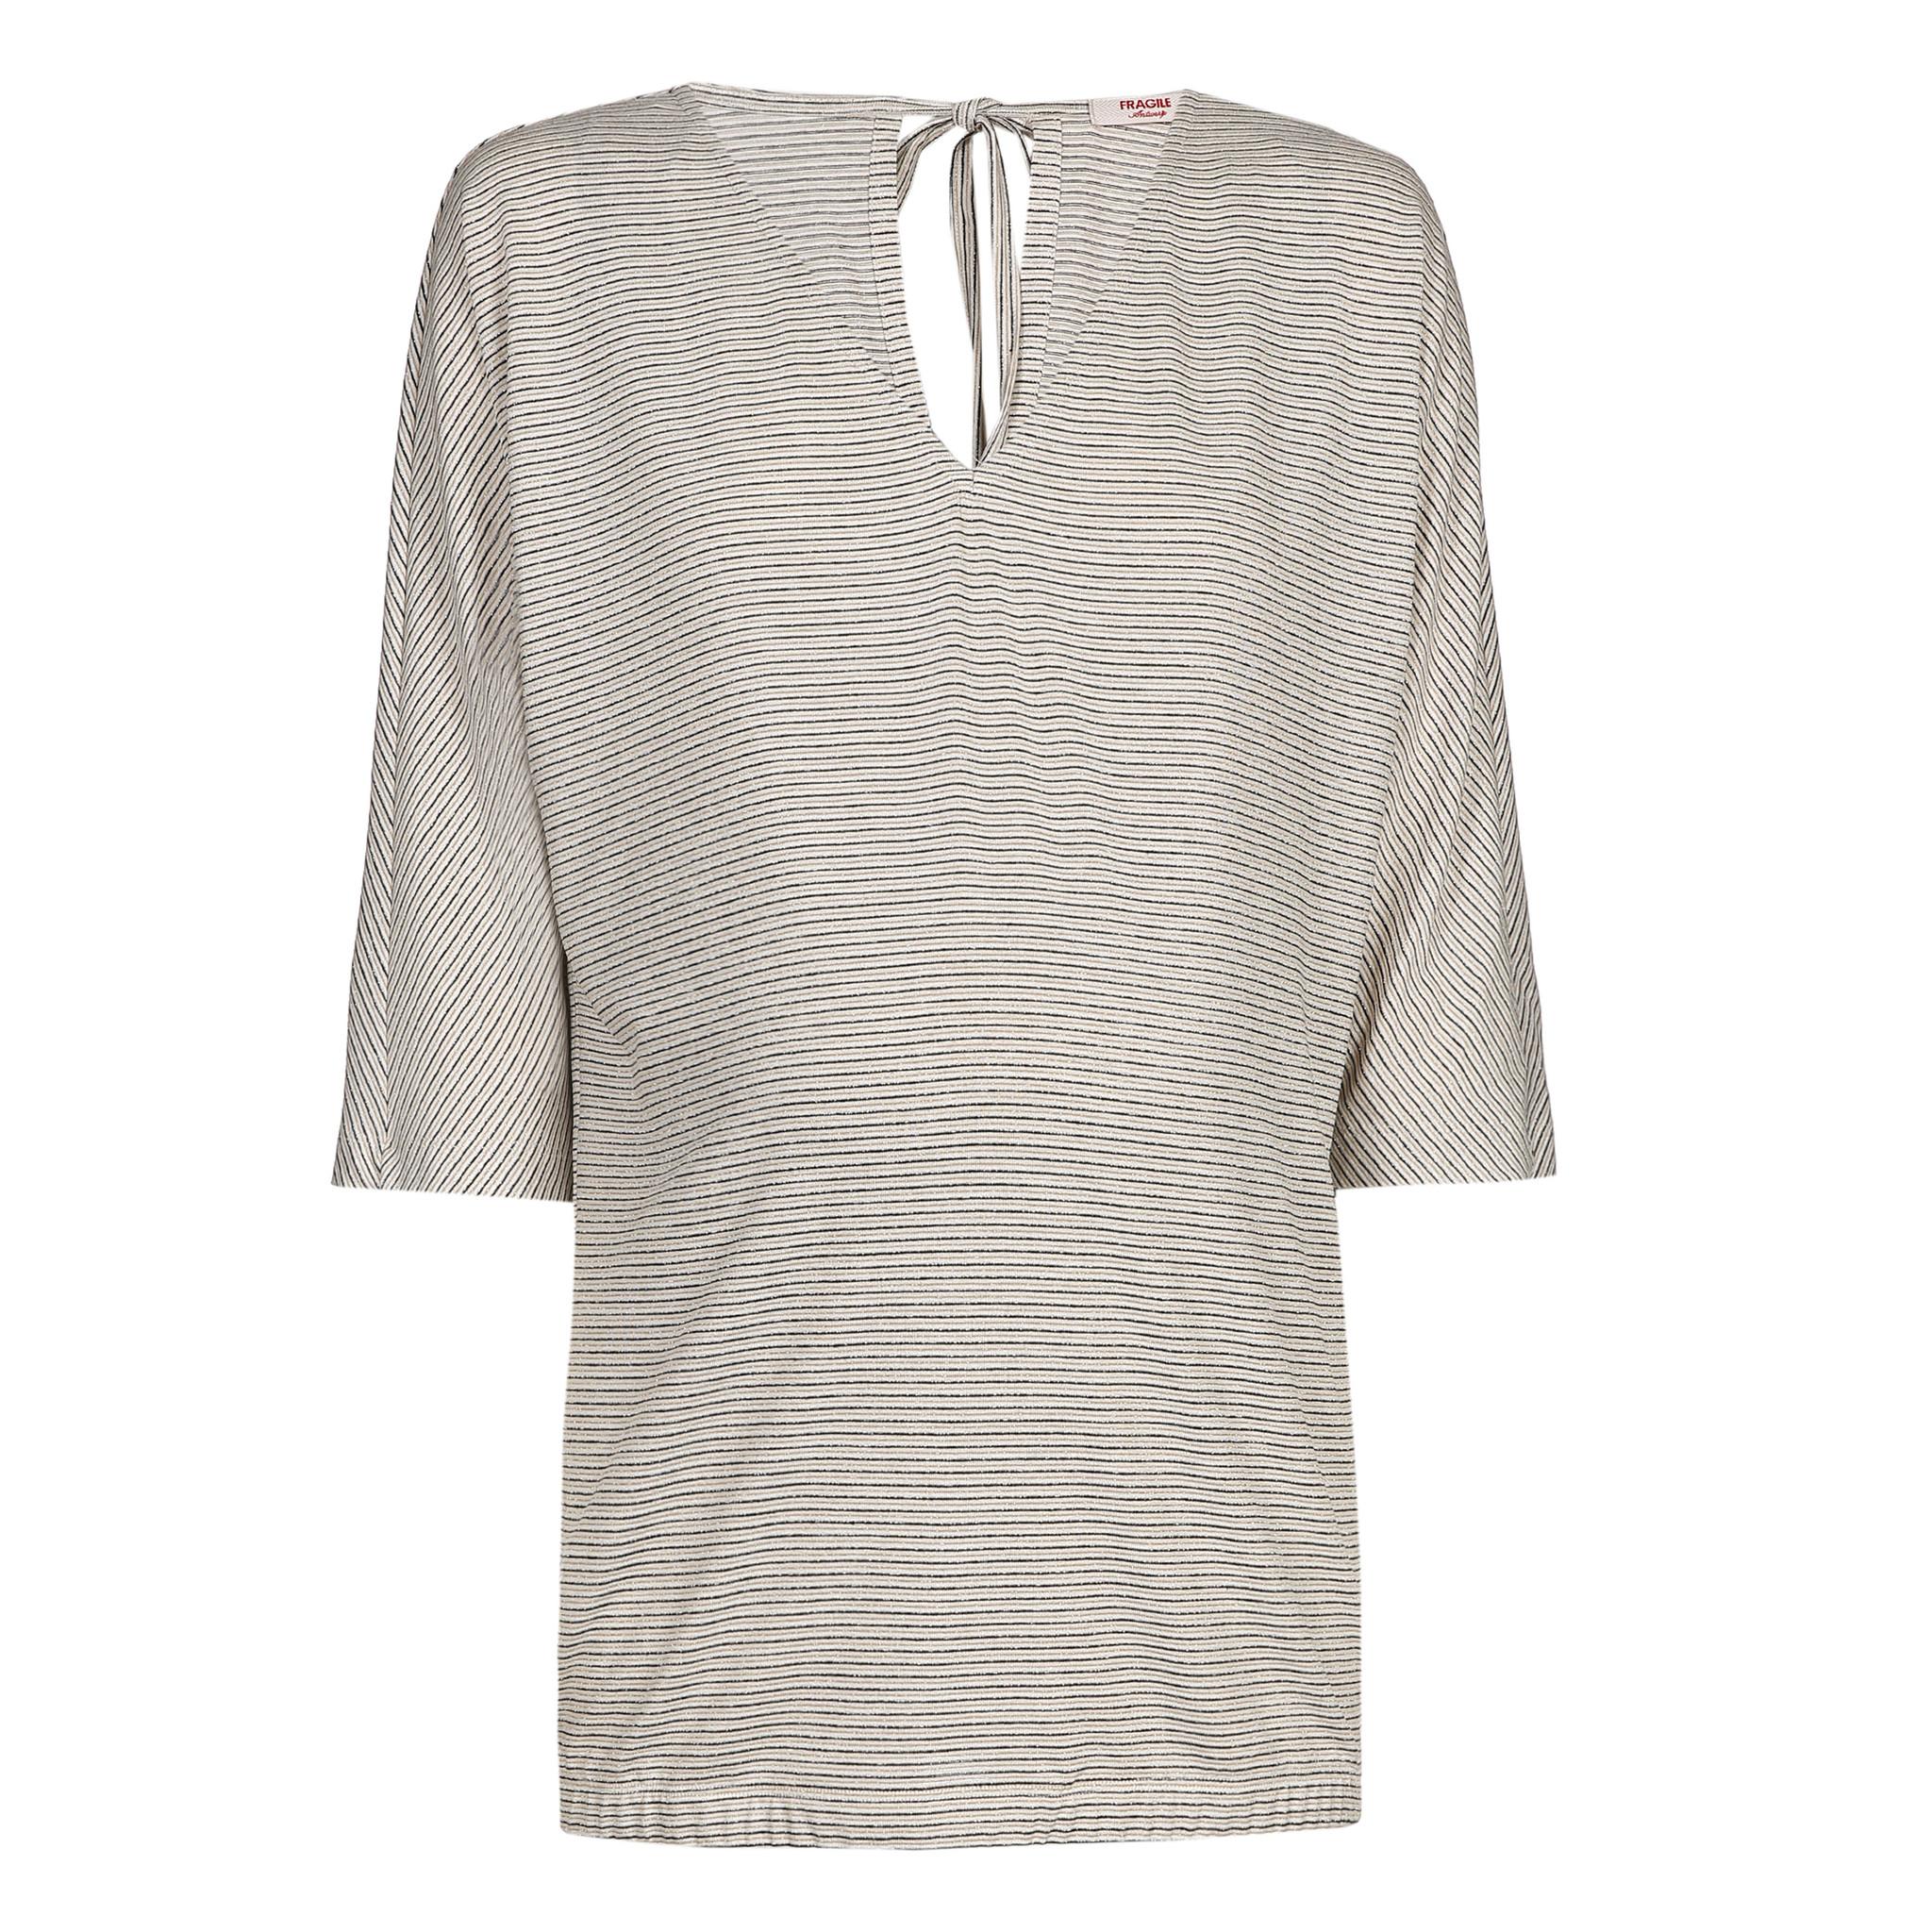 Tide Back T-Shirt Ecru Stripes-1